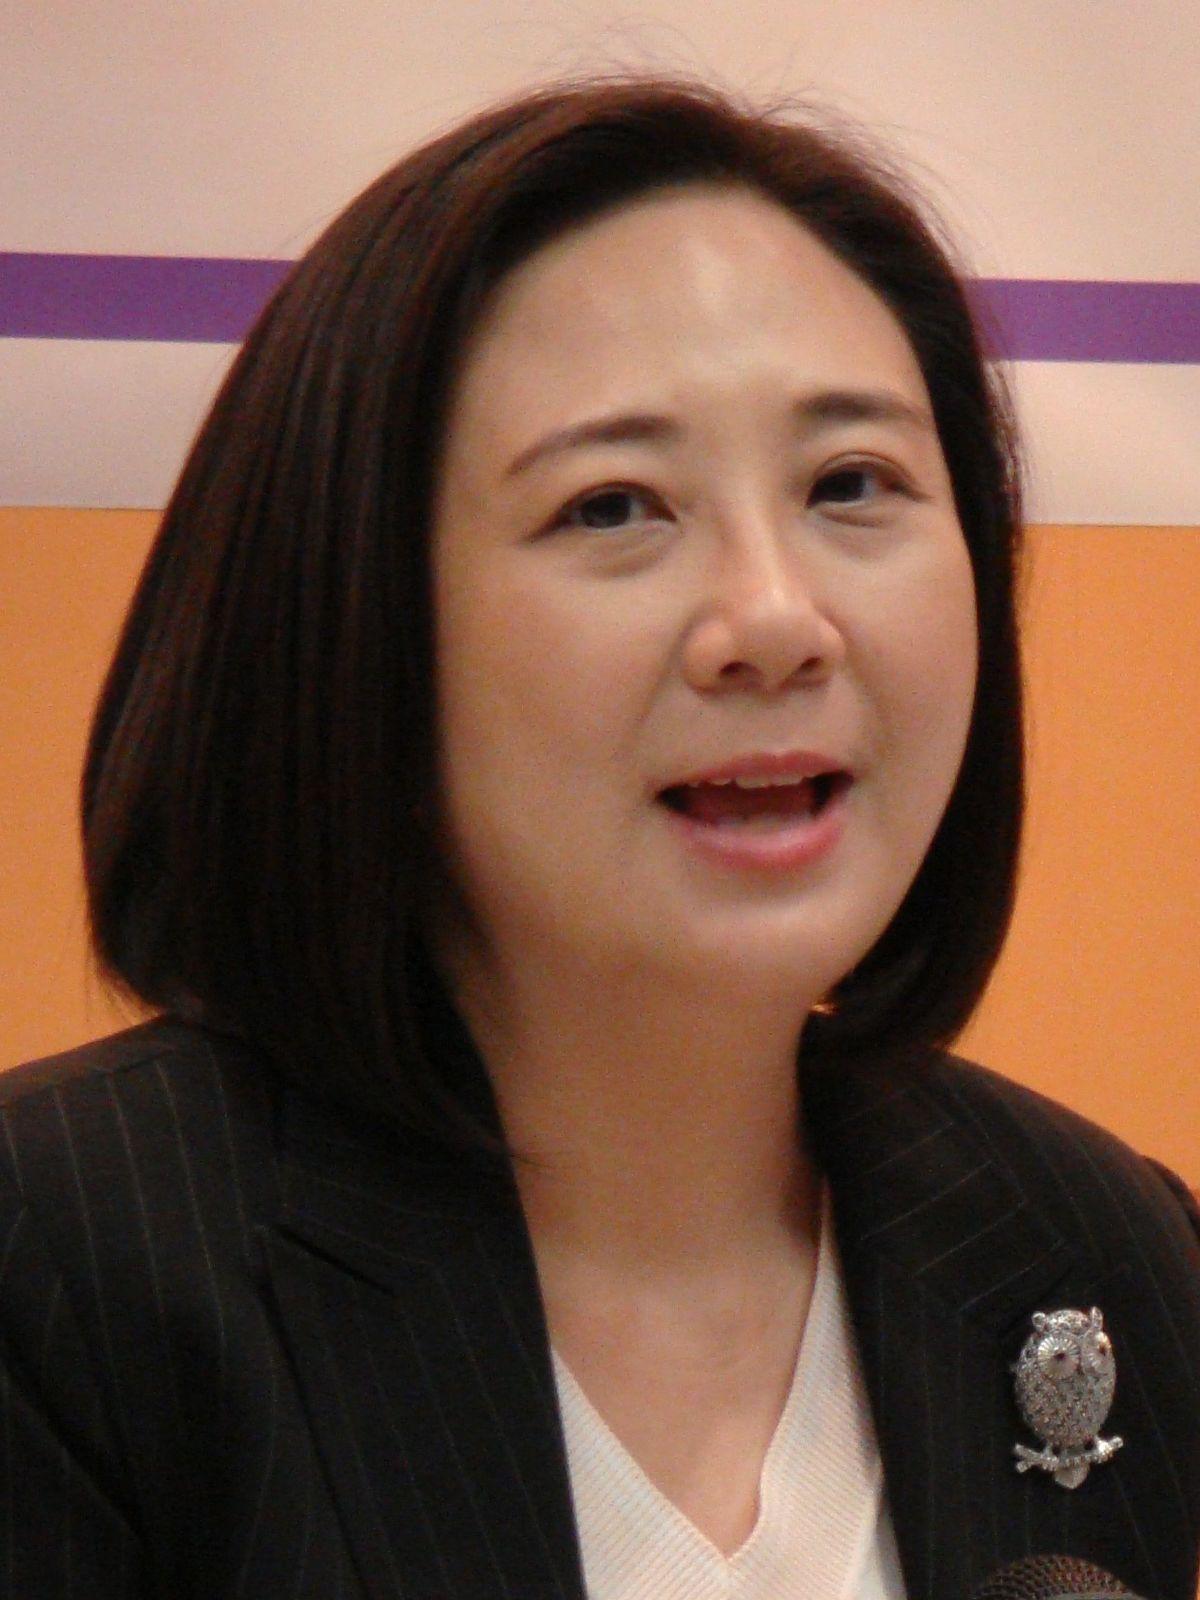 Doctor Of Business Administration >> Elizabeth Quat - Wikipedia